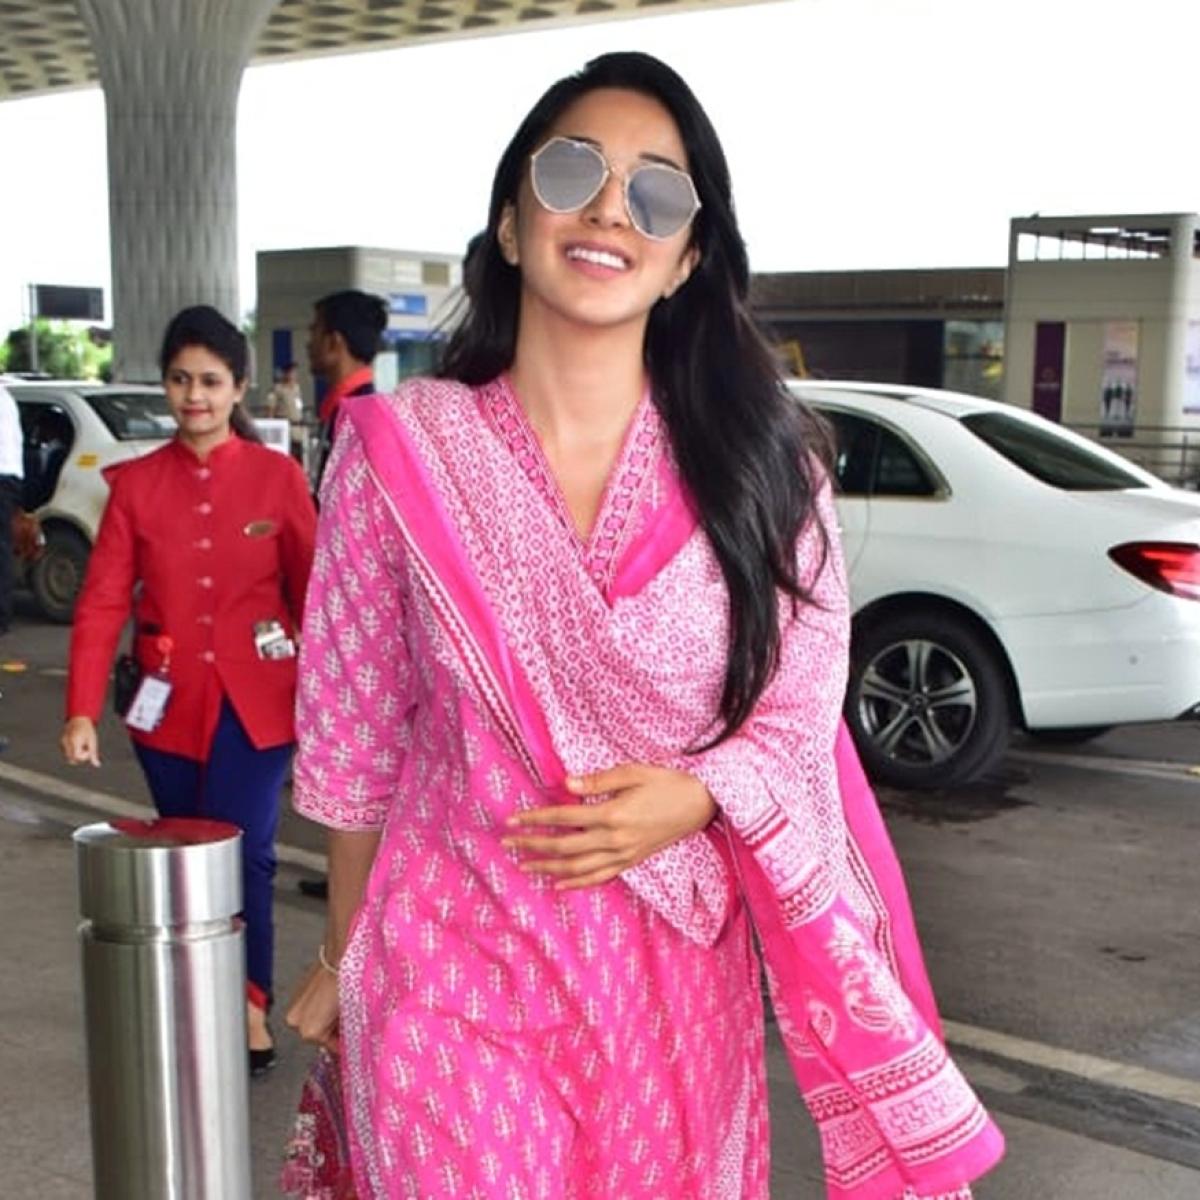 Kiara Advani's airport fashion consists of Rs 45,000 flip flops